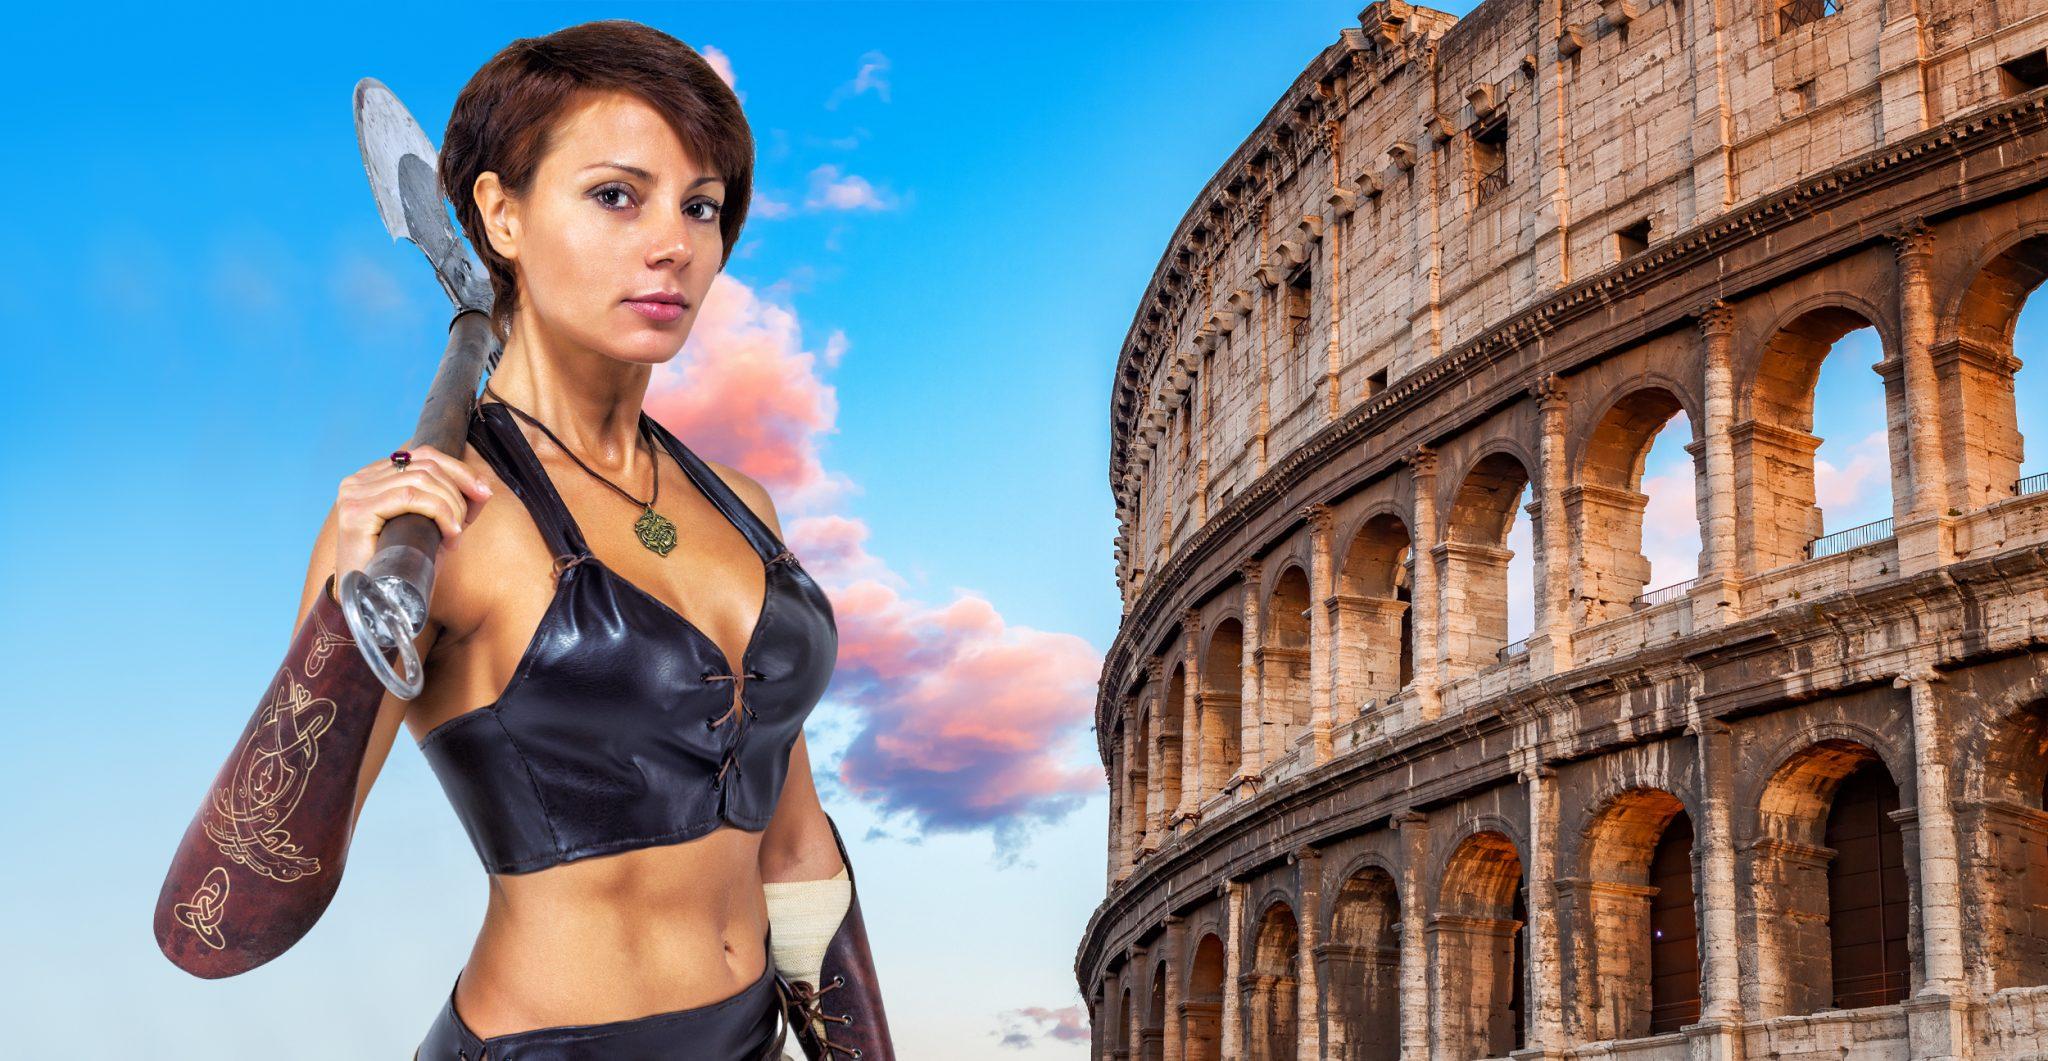 Female Gladiators are called Gladiatrix